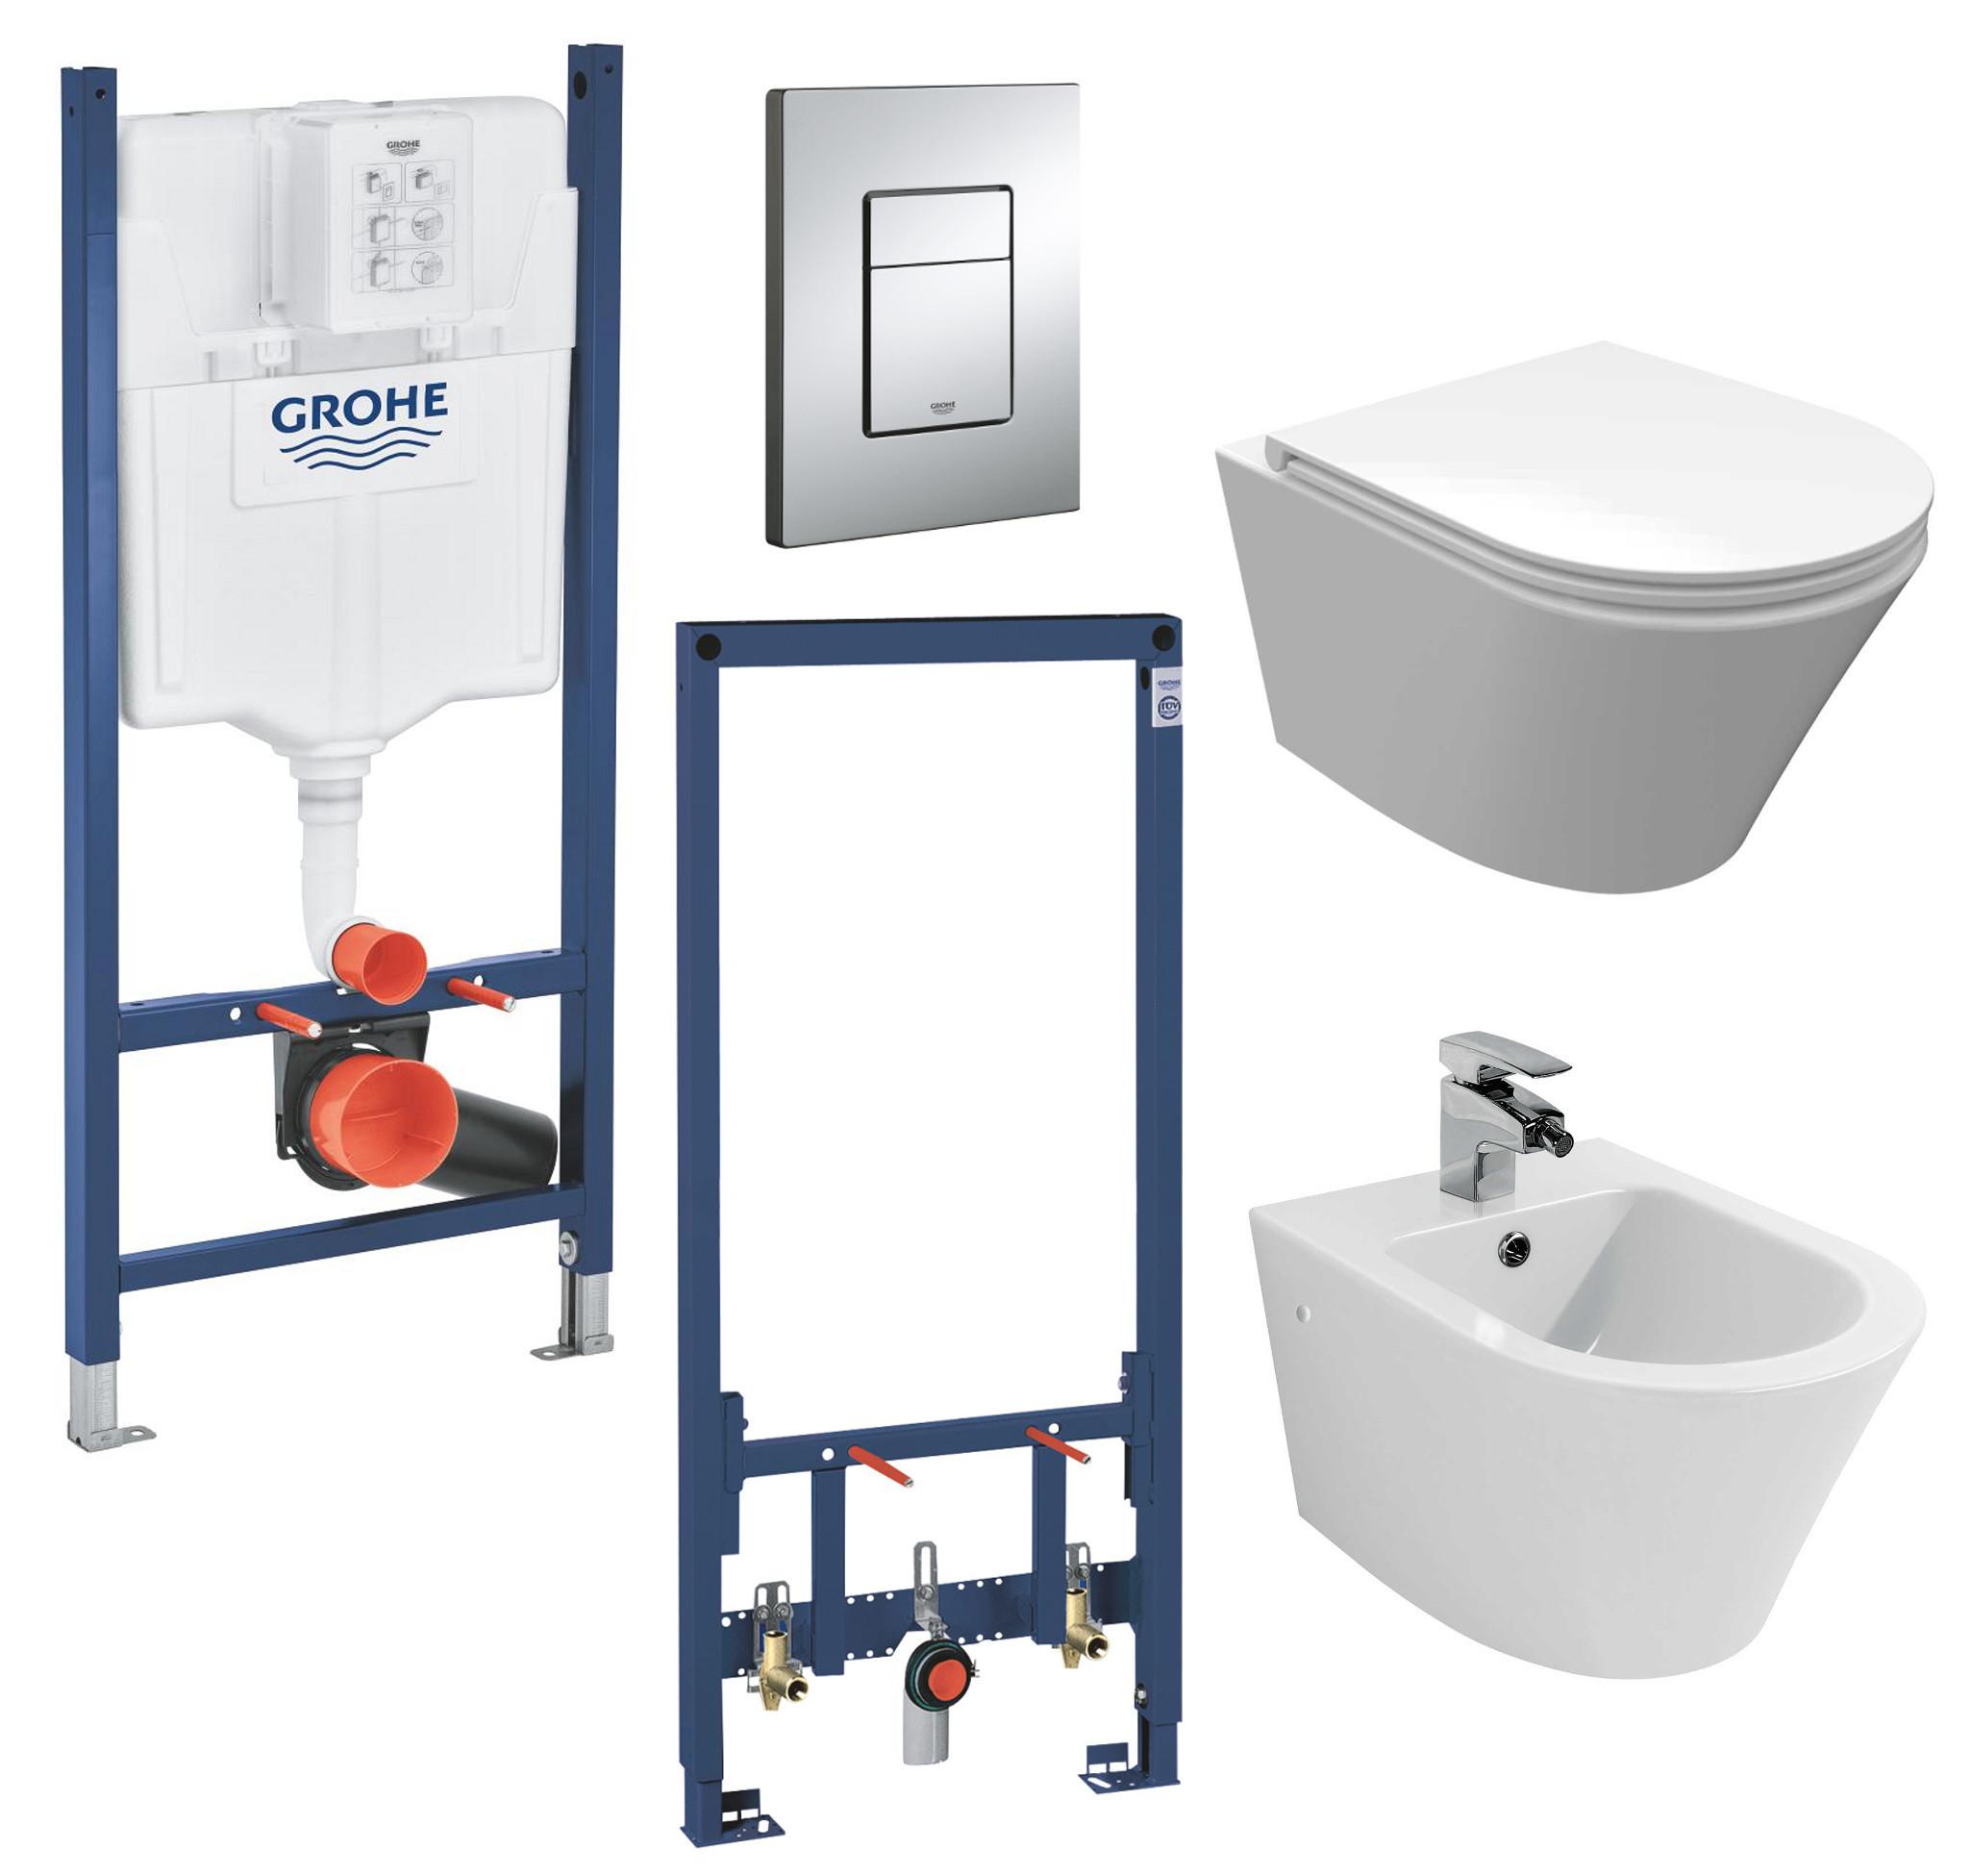 vanvilla WC spülrandlos rimless + Bidet Luanda + Grohe 38772001 + 38553001 SET